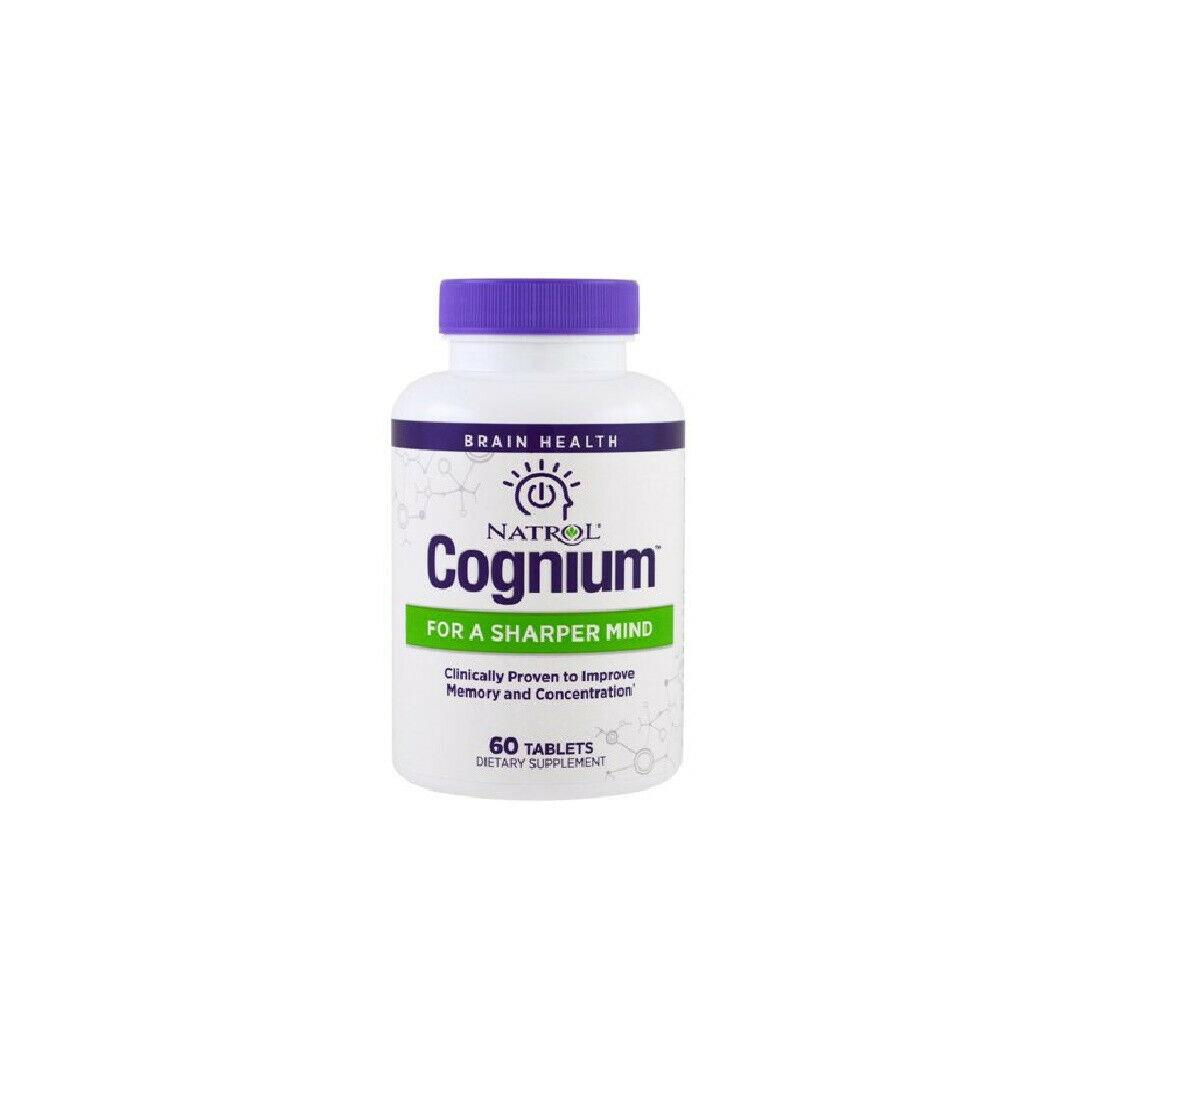 Natrol Cognium Brain Health Improve MEMORY 60 Tablets 2020 Stimulant-New in box